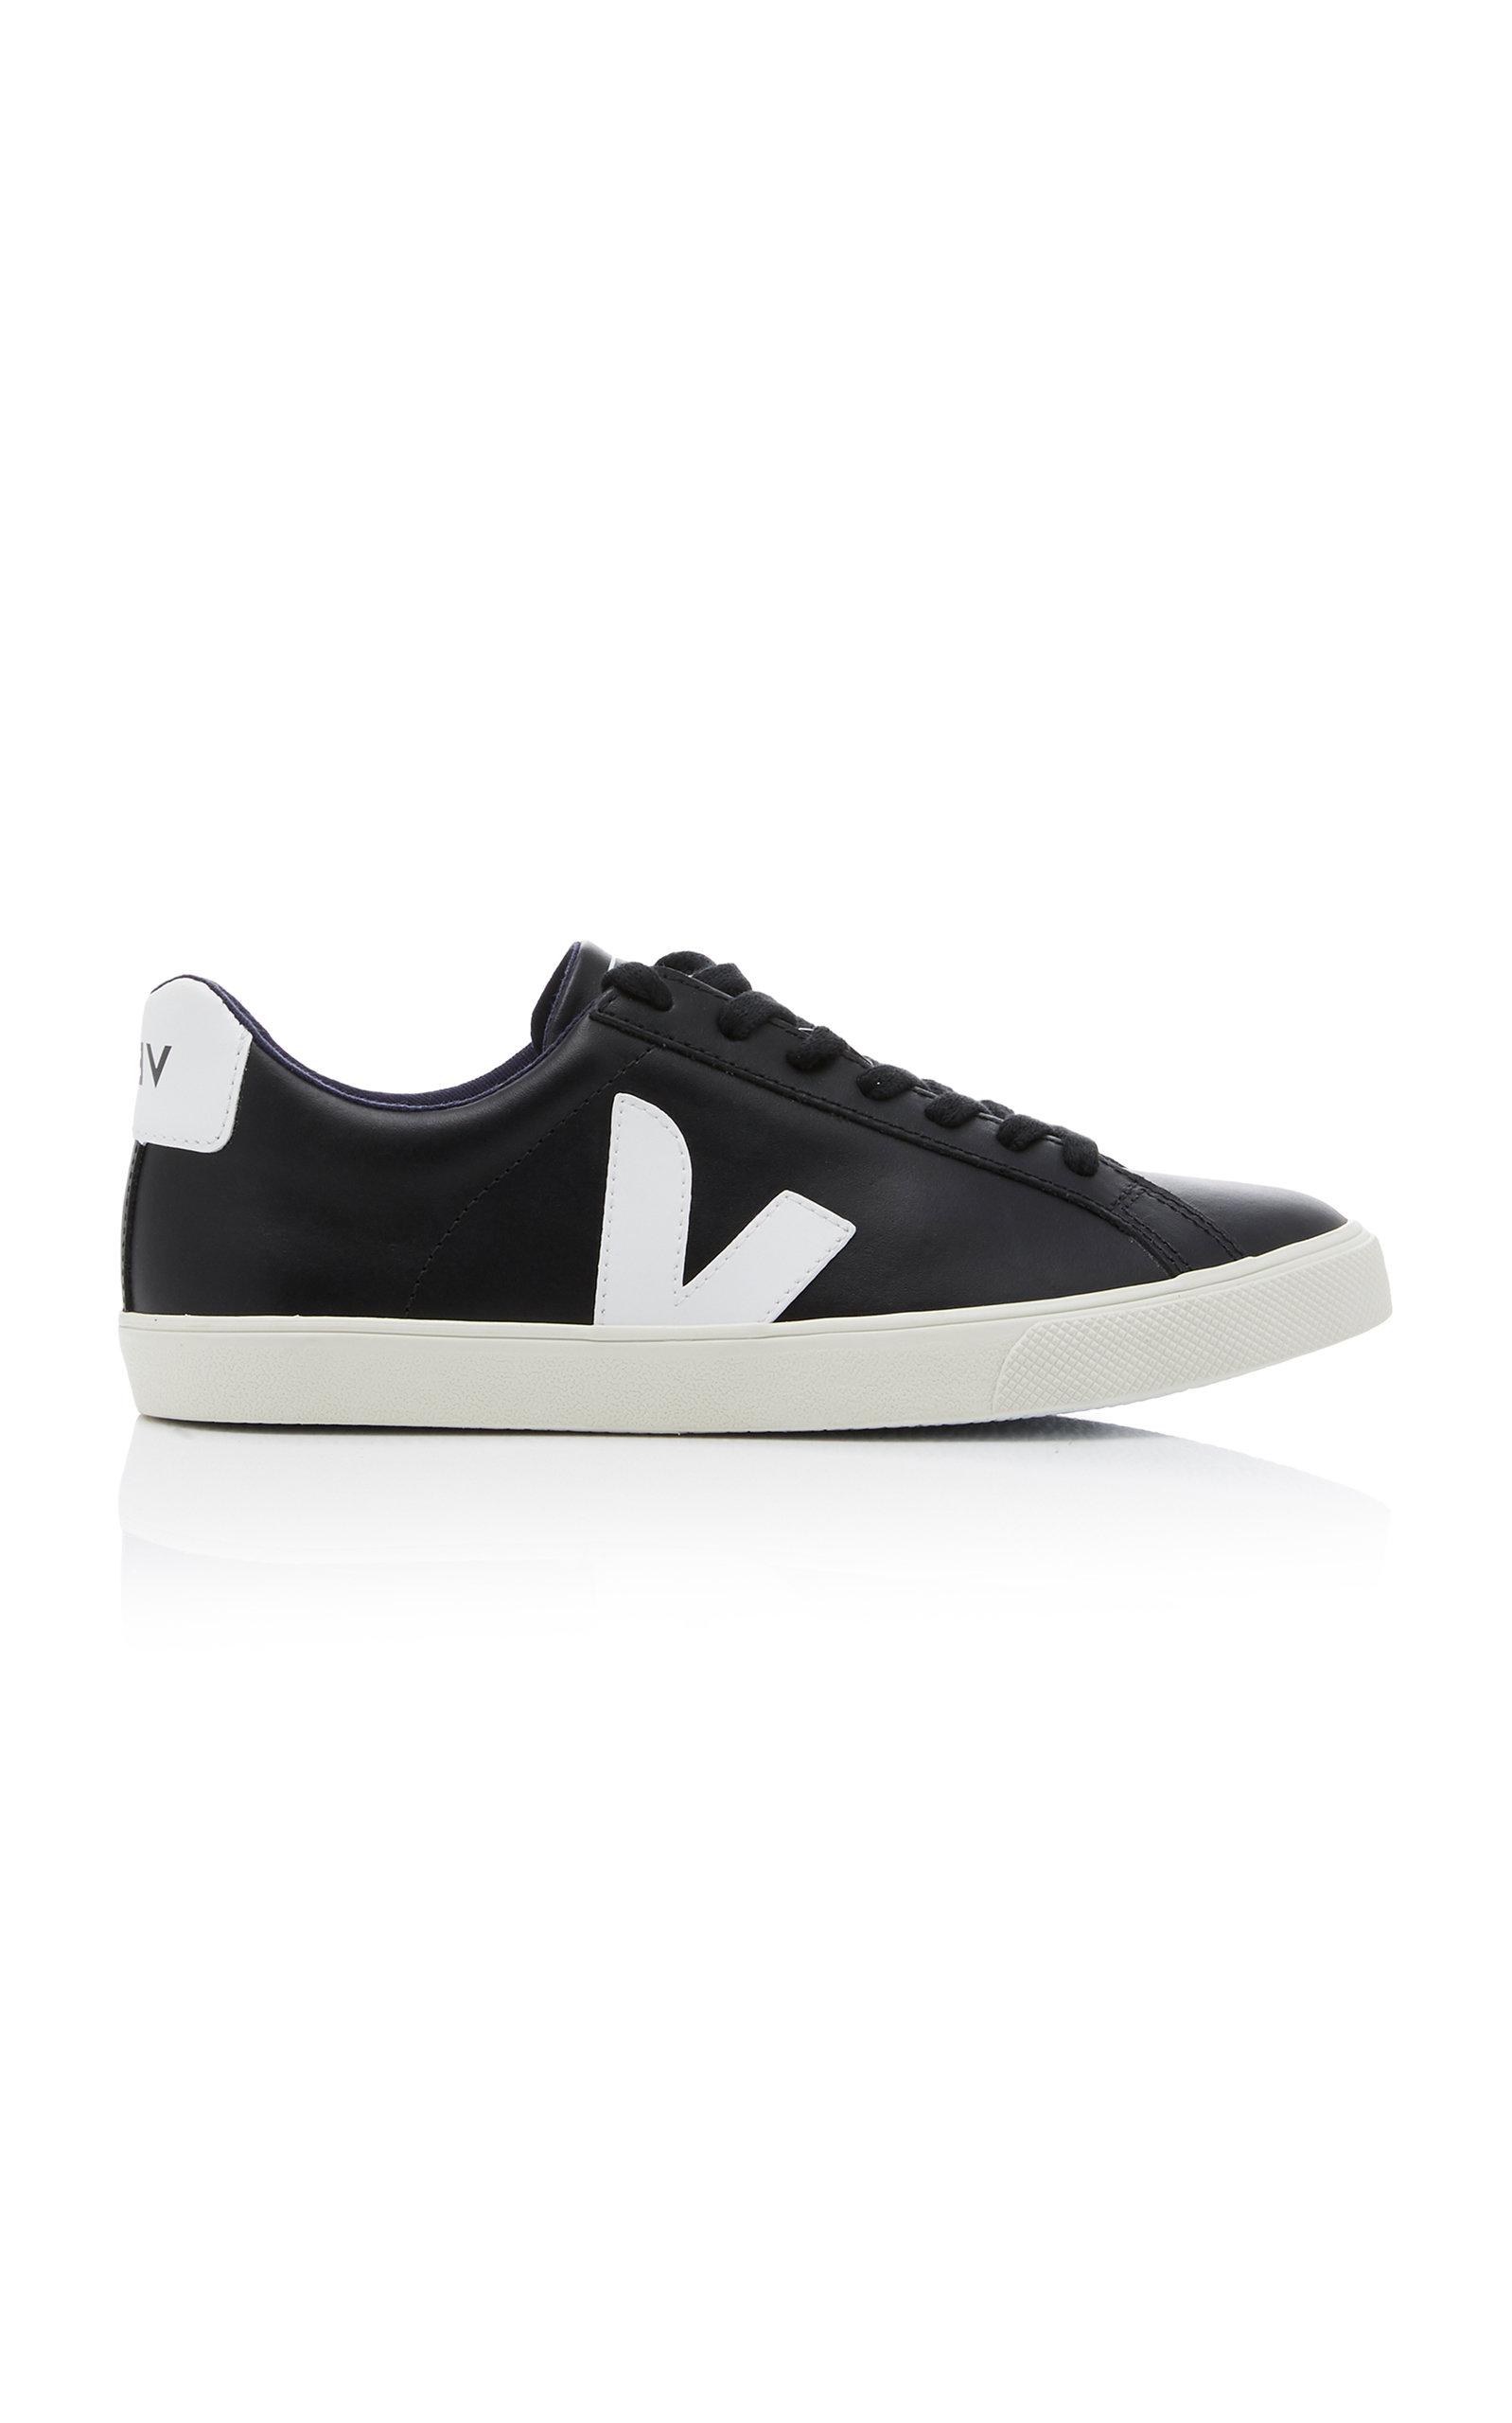 Veja | VEJA Esplar Two-Tone Leather Sneakers | Clouty